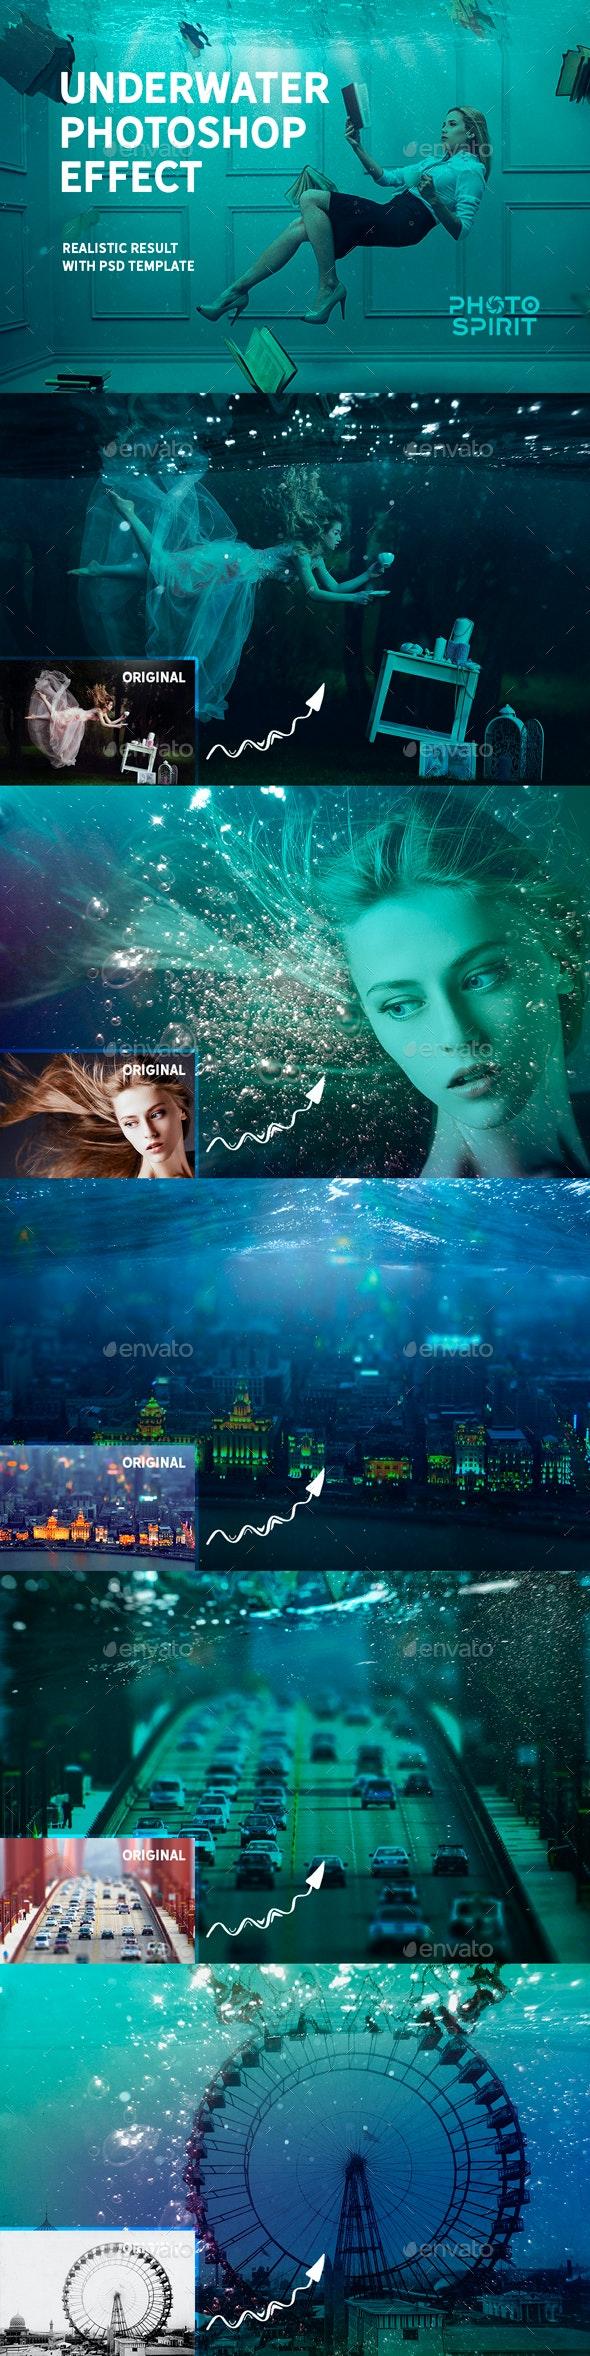 Underwater Photoshop Effect - Nature Photo Templates